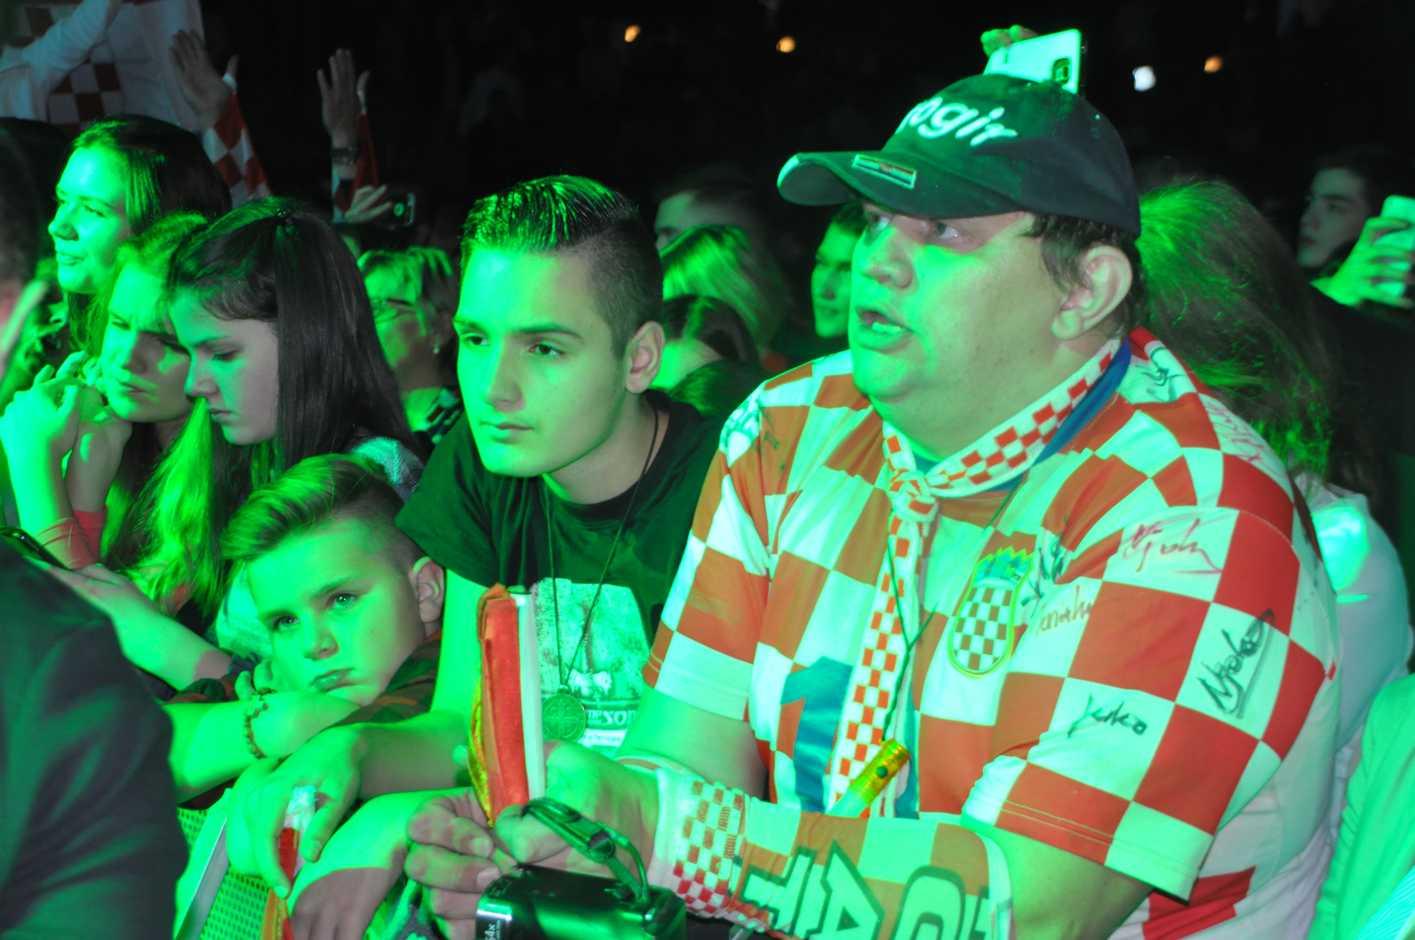 hrvatska-noc-2016-30